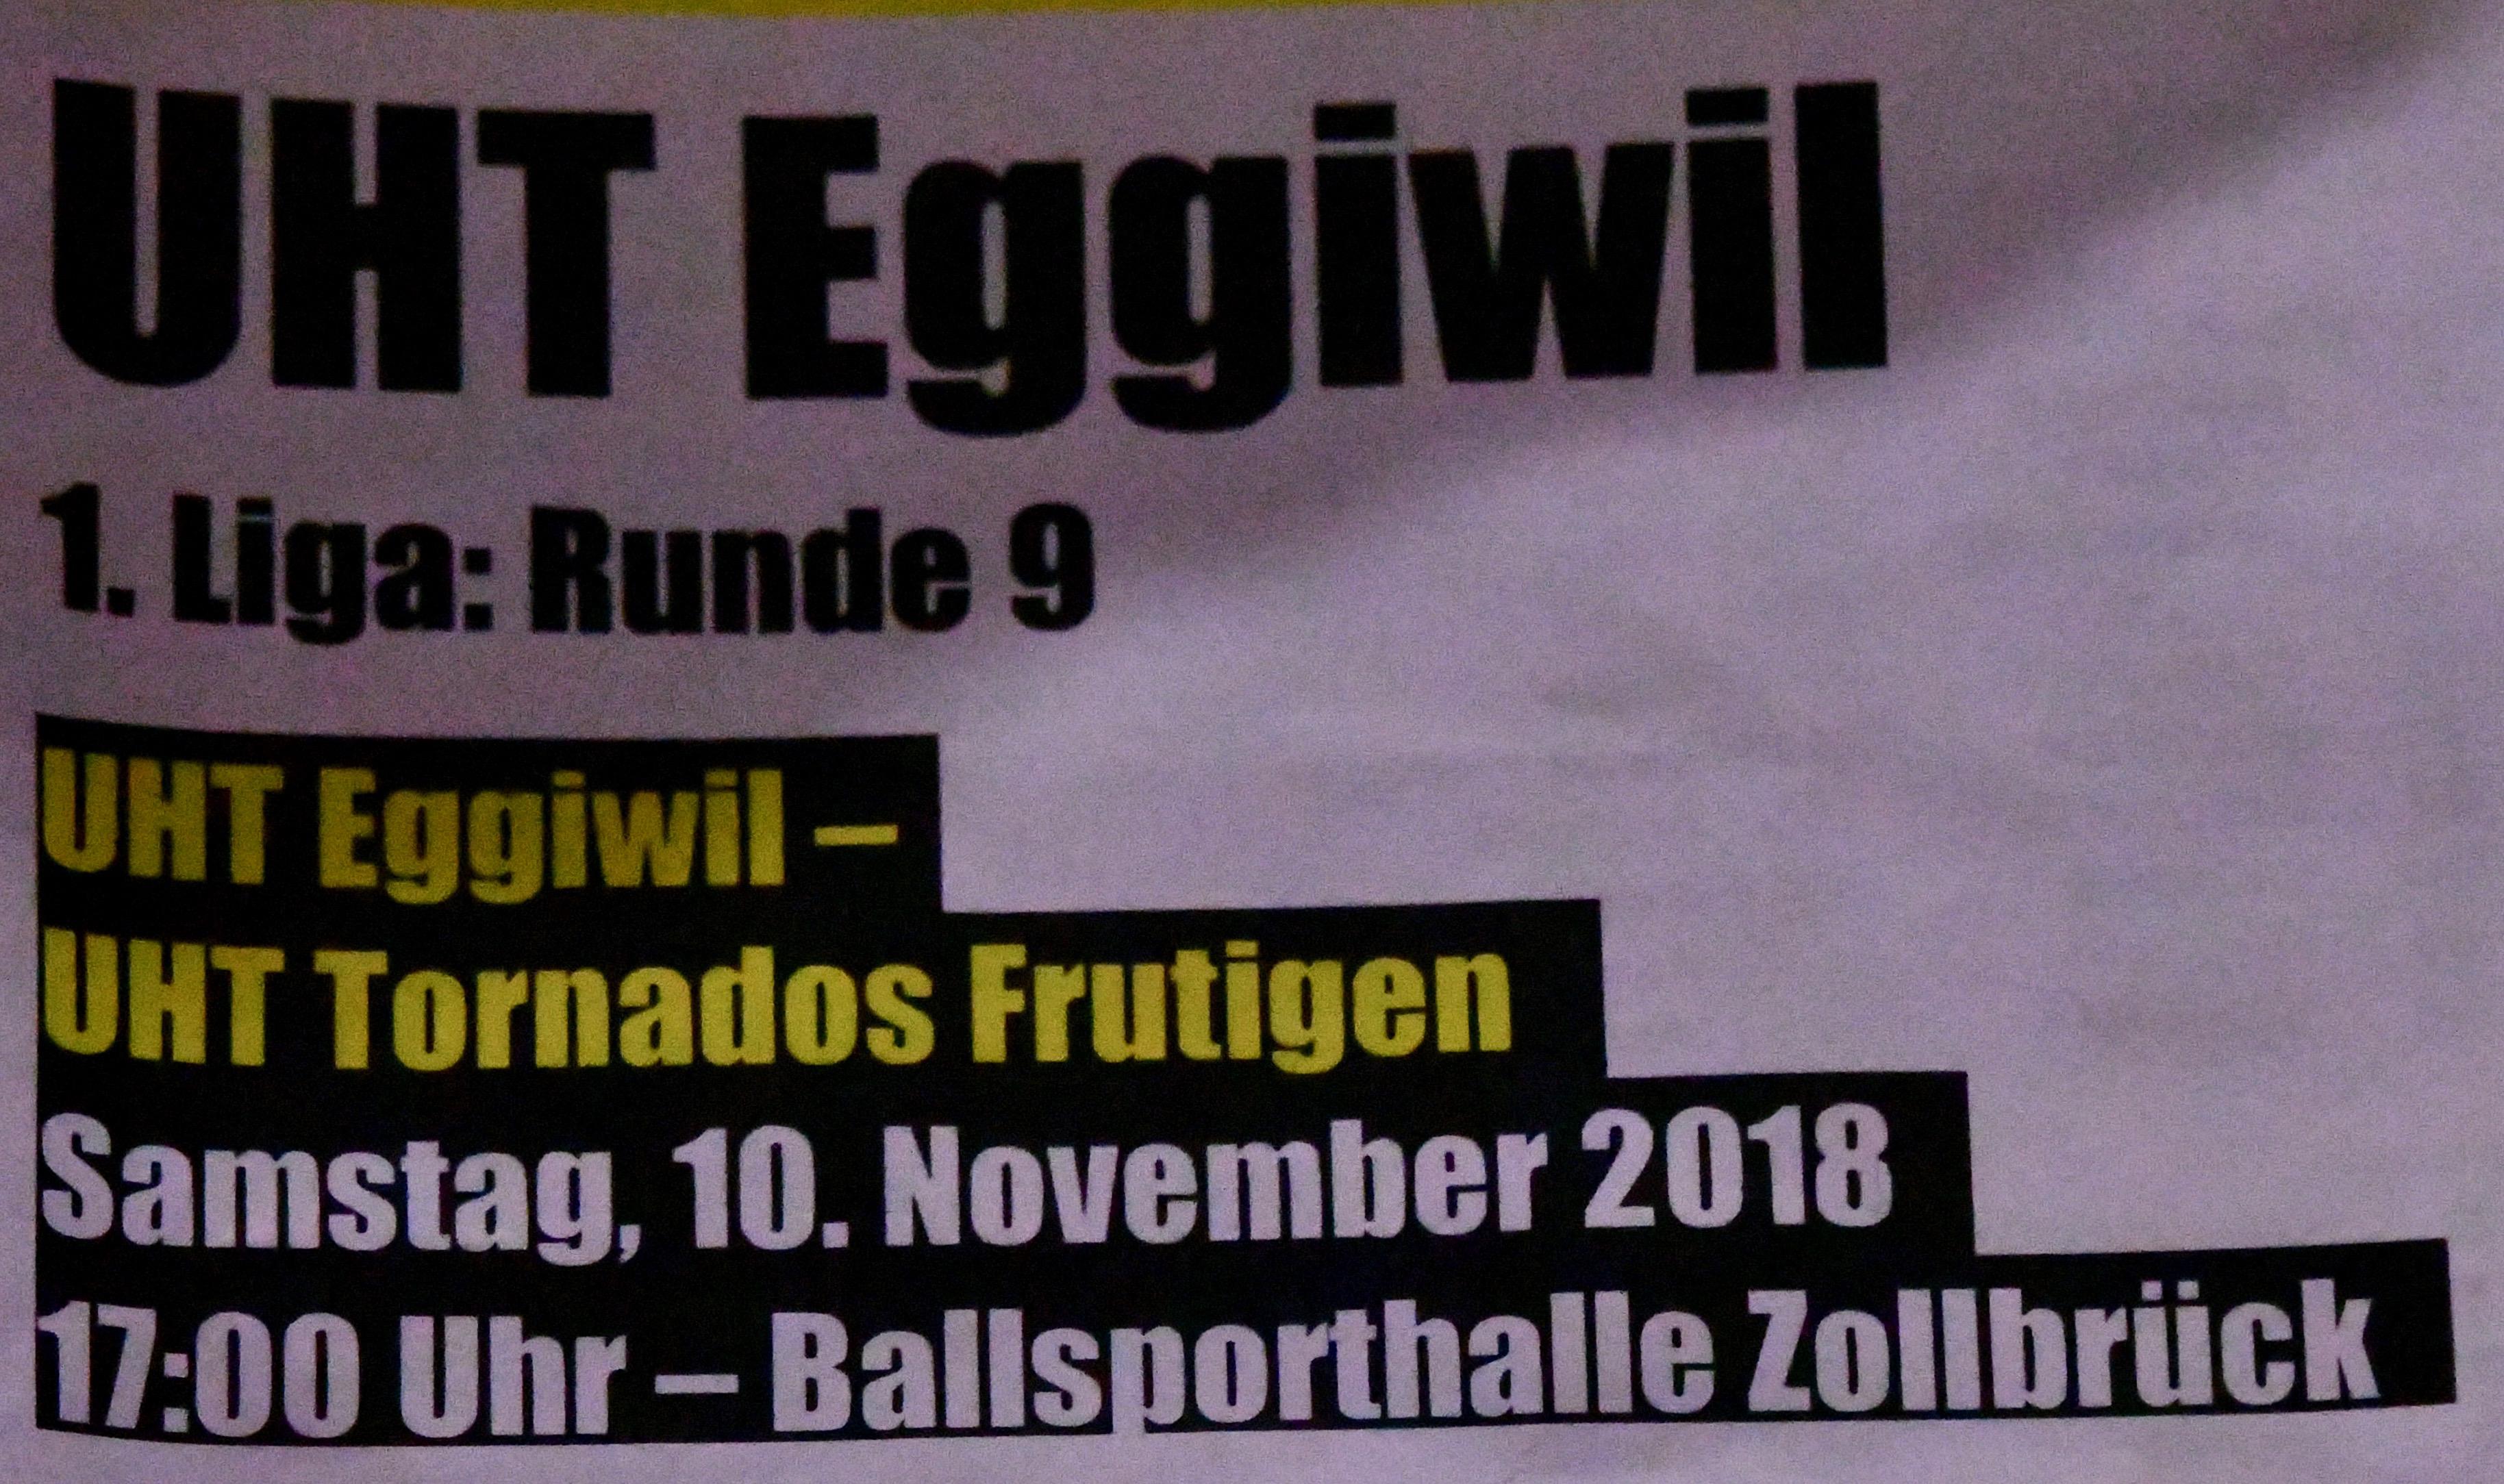 Herren I - UHT Tornados Frutigen Saison 2018/19